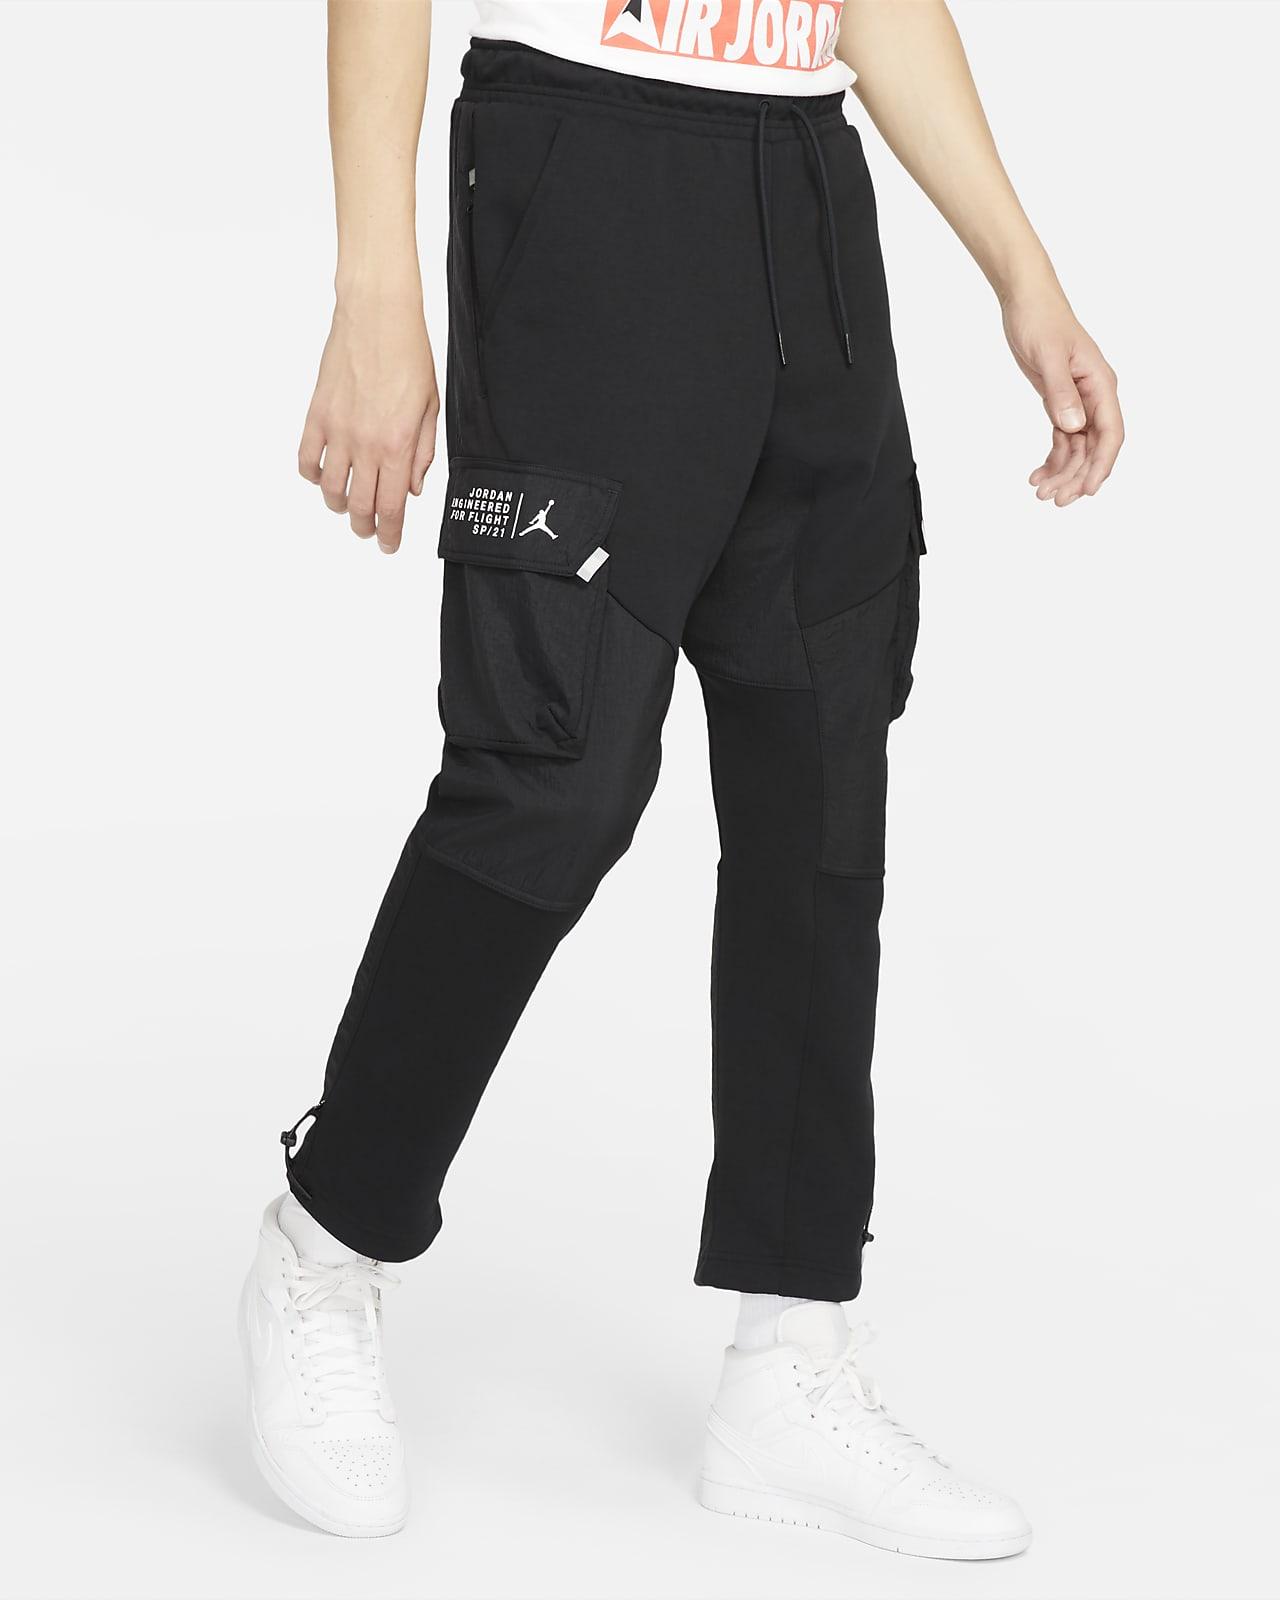 Pantaloni in fleece Jordan 23 Engineered - Uomo